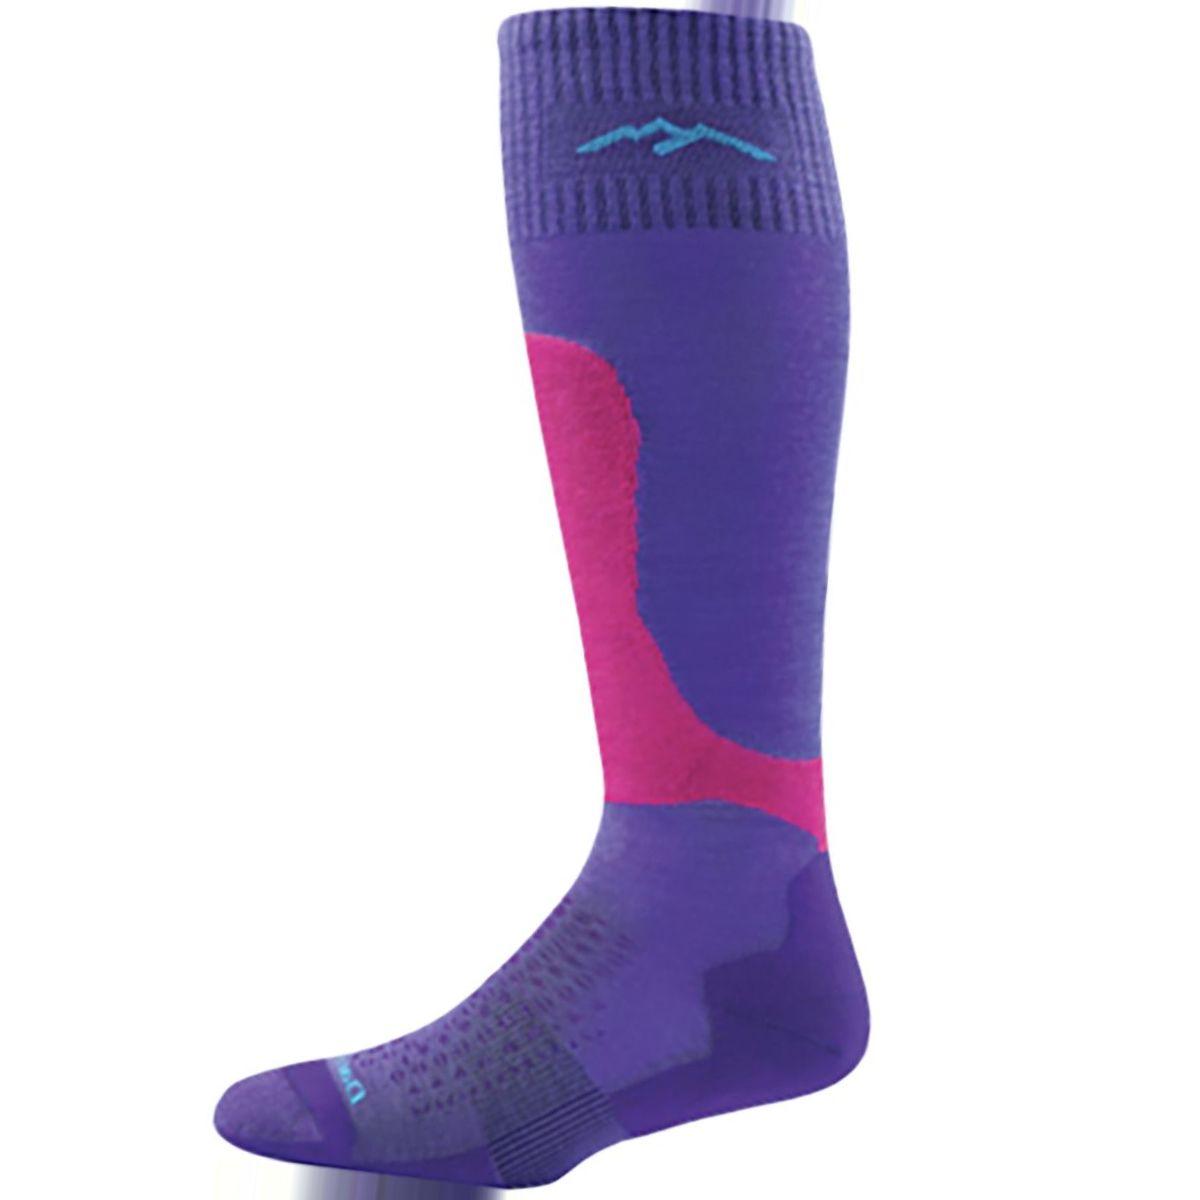 Darn Tough Fall Line OTC Padded Light Cushion Sock - Women's